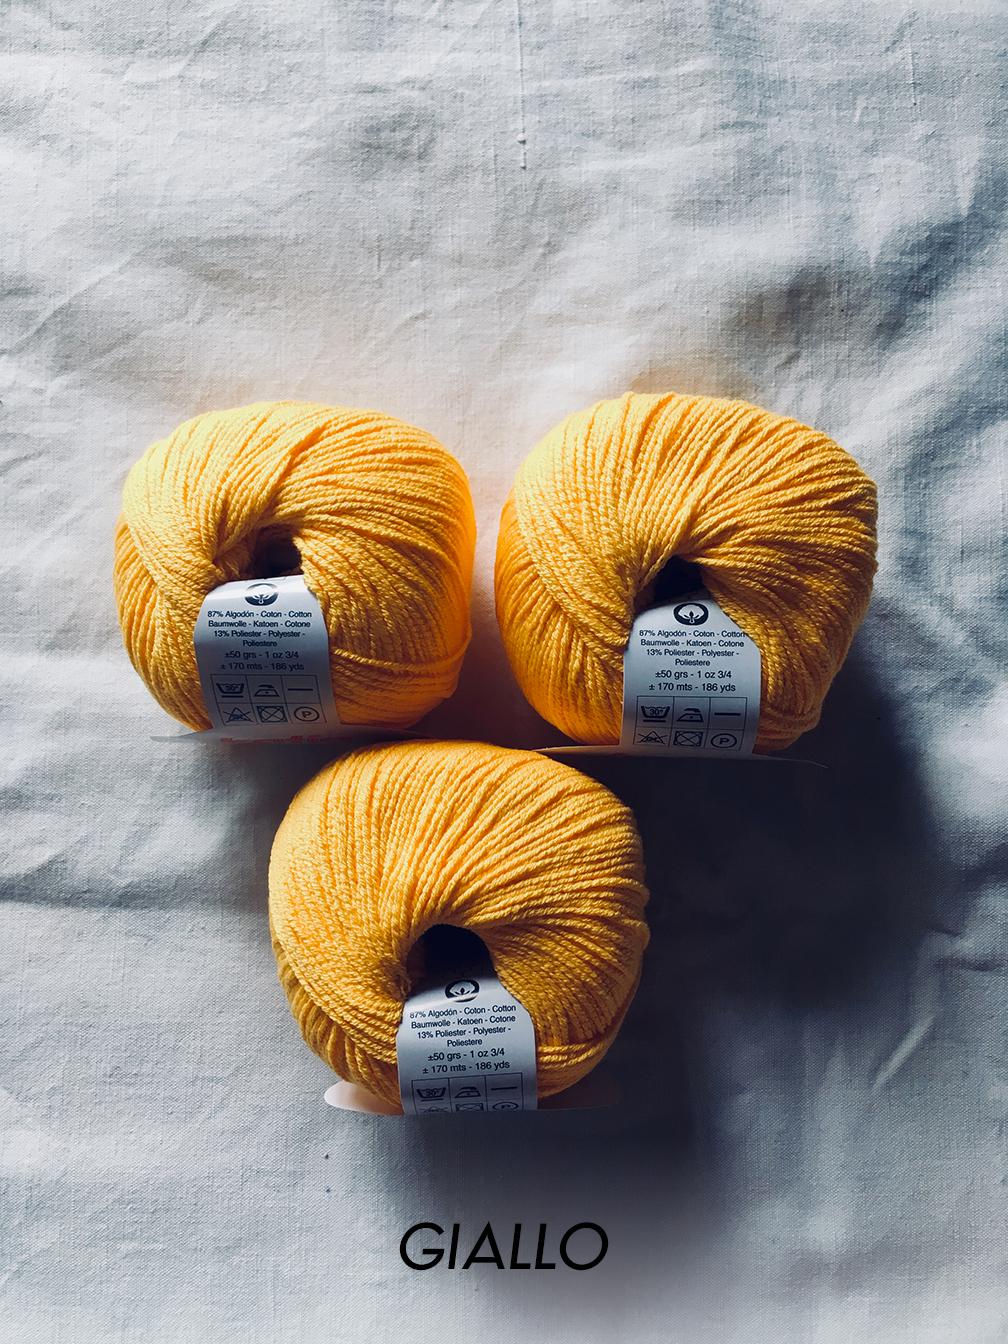 katia_cotton_stretch_giallo_36_wool_done_knitting.jpg